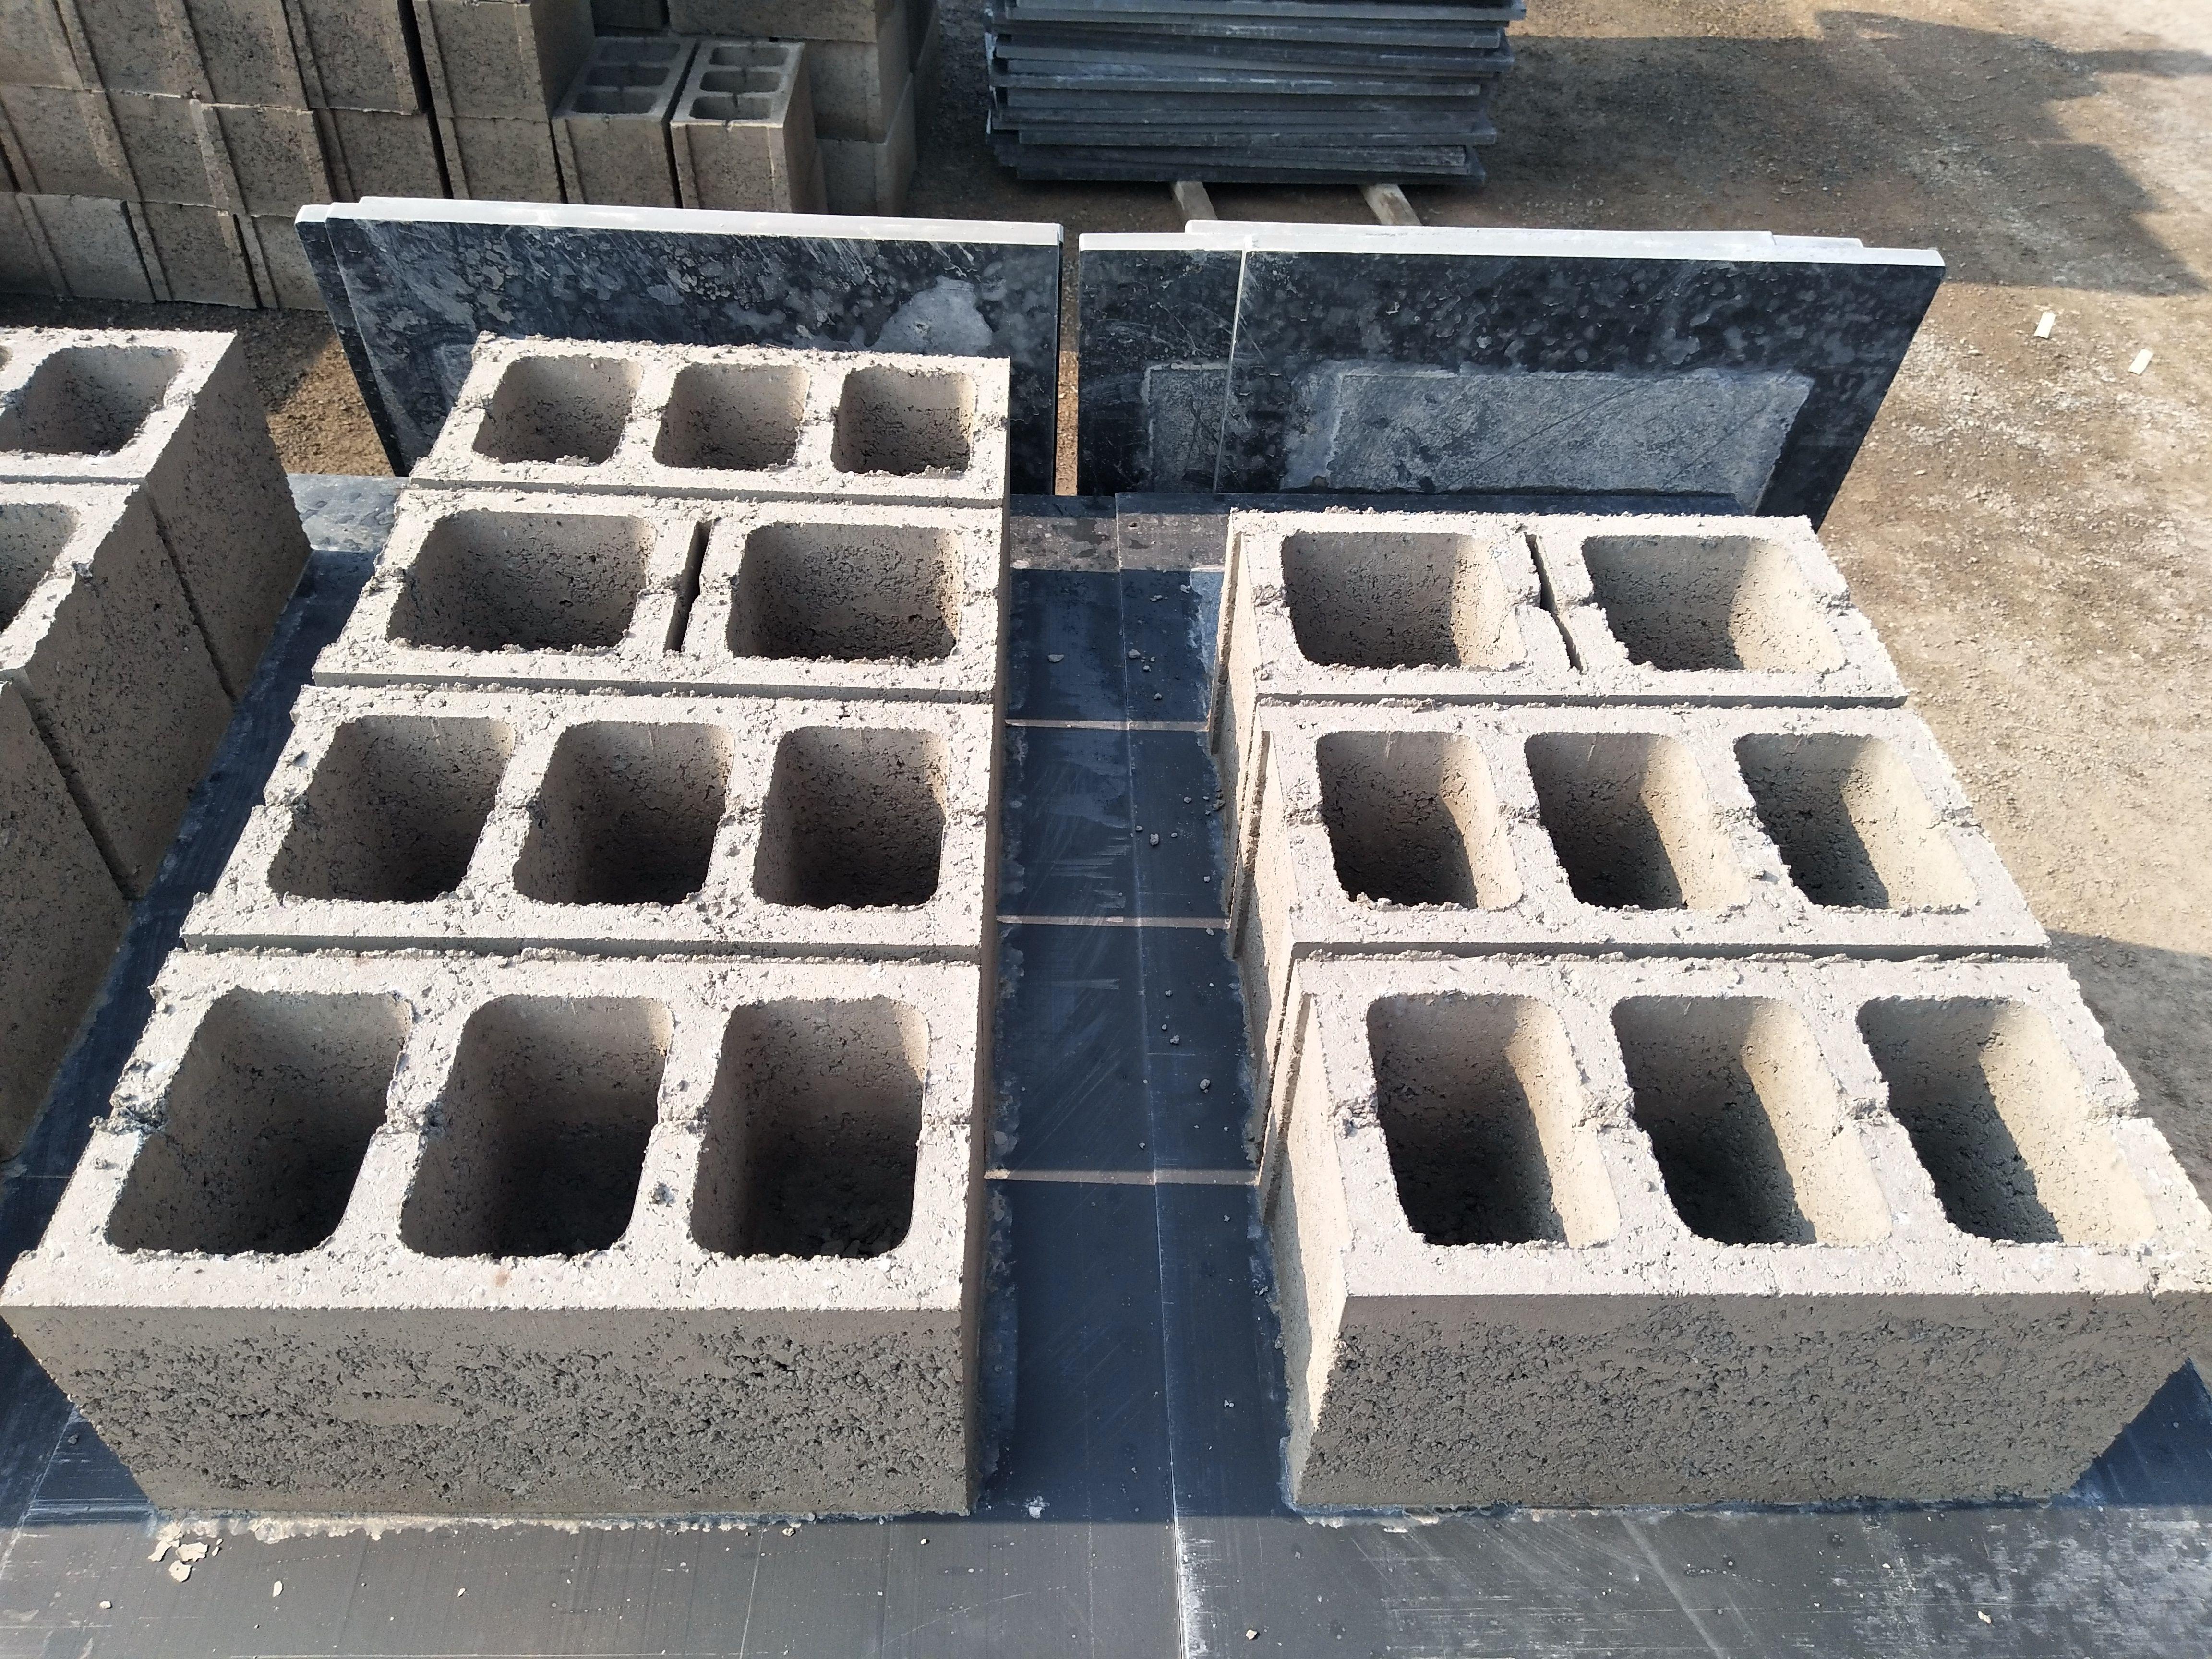 Concrete Hollow Block Philippines Hollow Block 8inch 6inch 5inch Concrete Blocks Price Concrete Blocks Interlocking Bricks Concrete